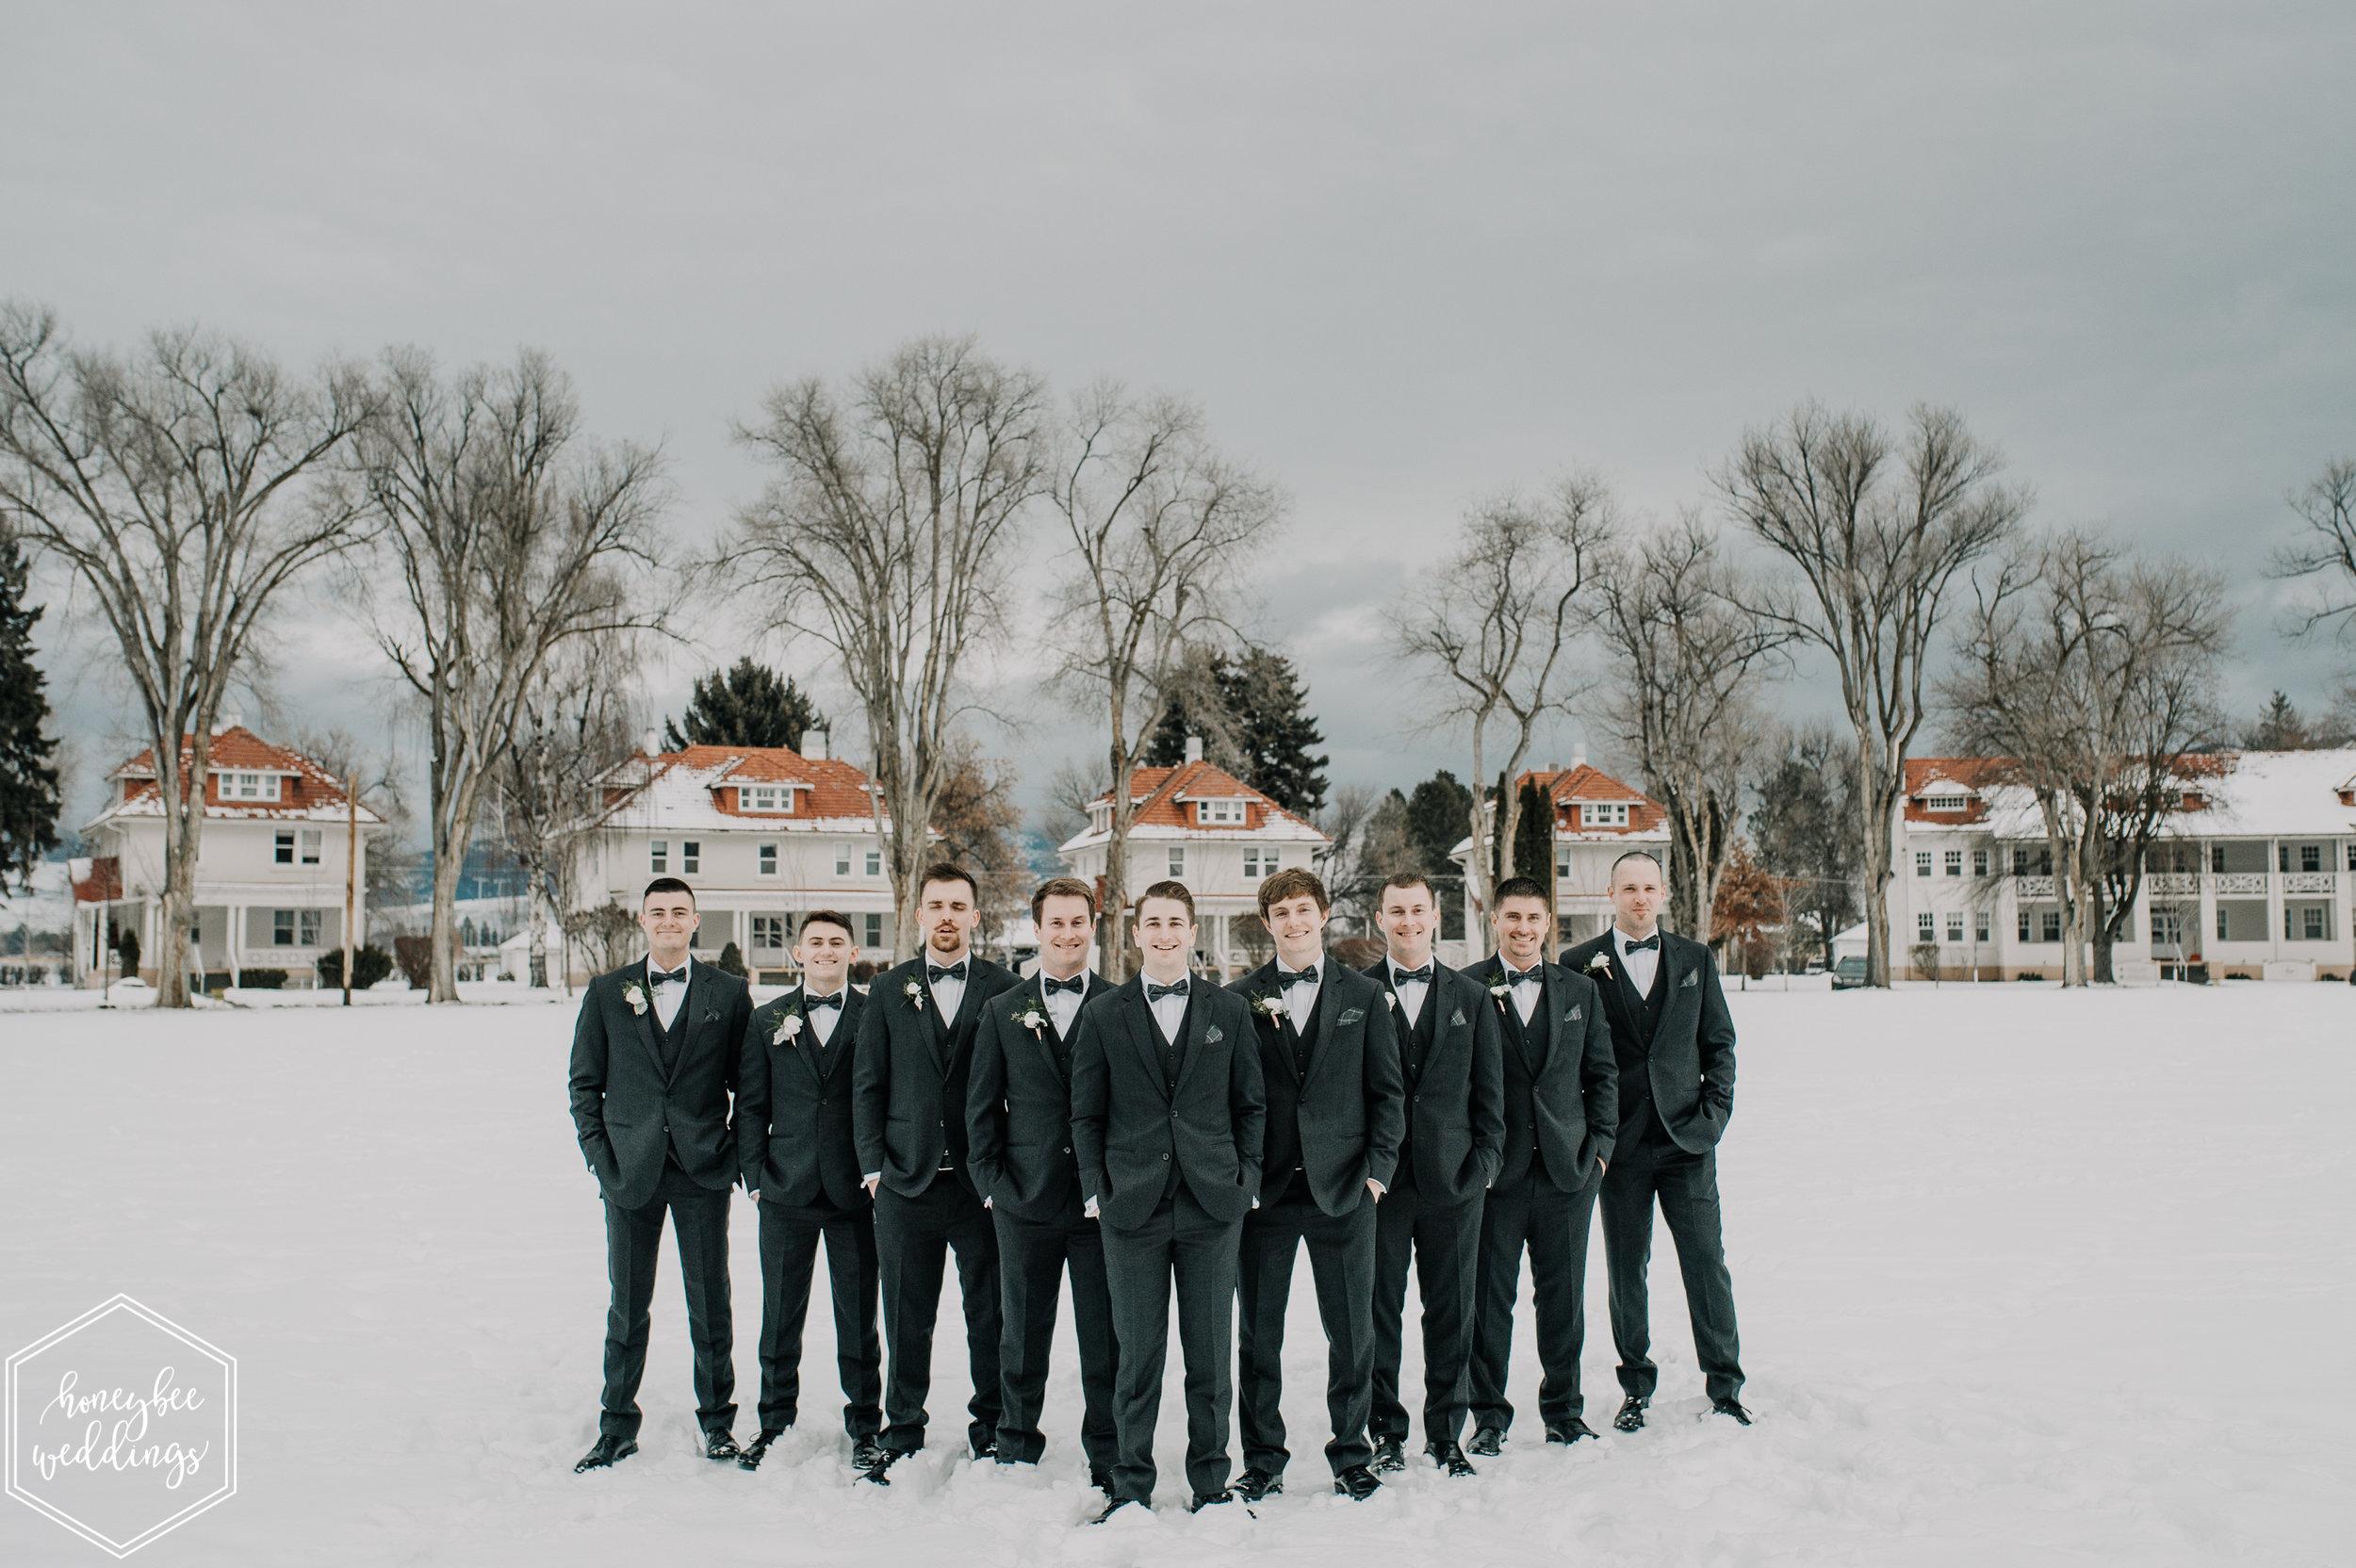 0158Montana Wedding Photographer_Montana winter wedding_Wedding at Fort Missoula_Meri & Carter_January 19, 2018-287.jpg